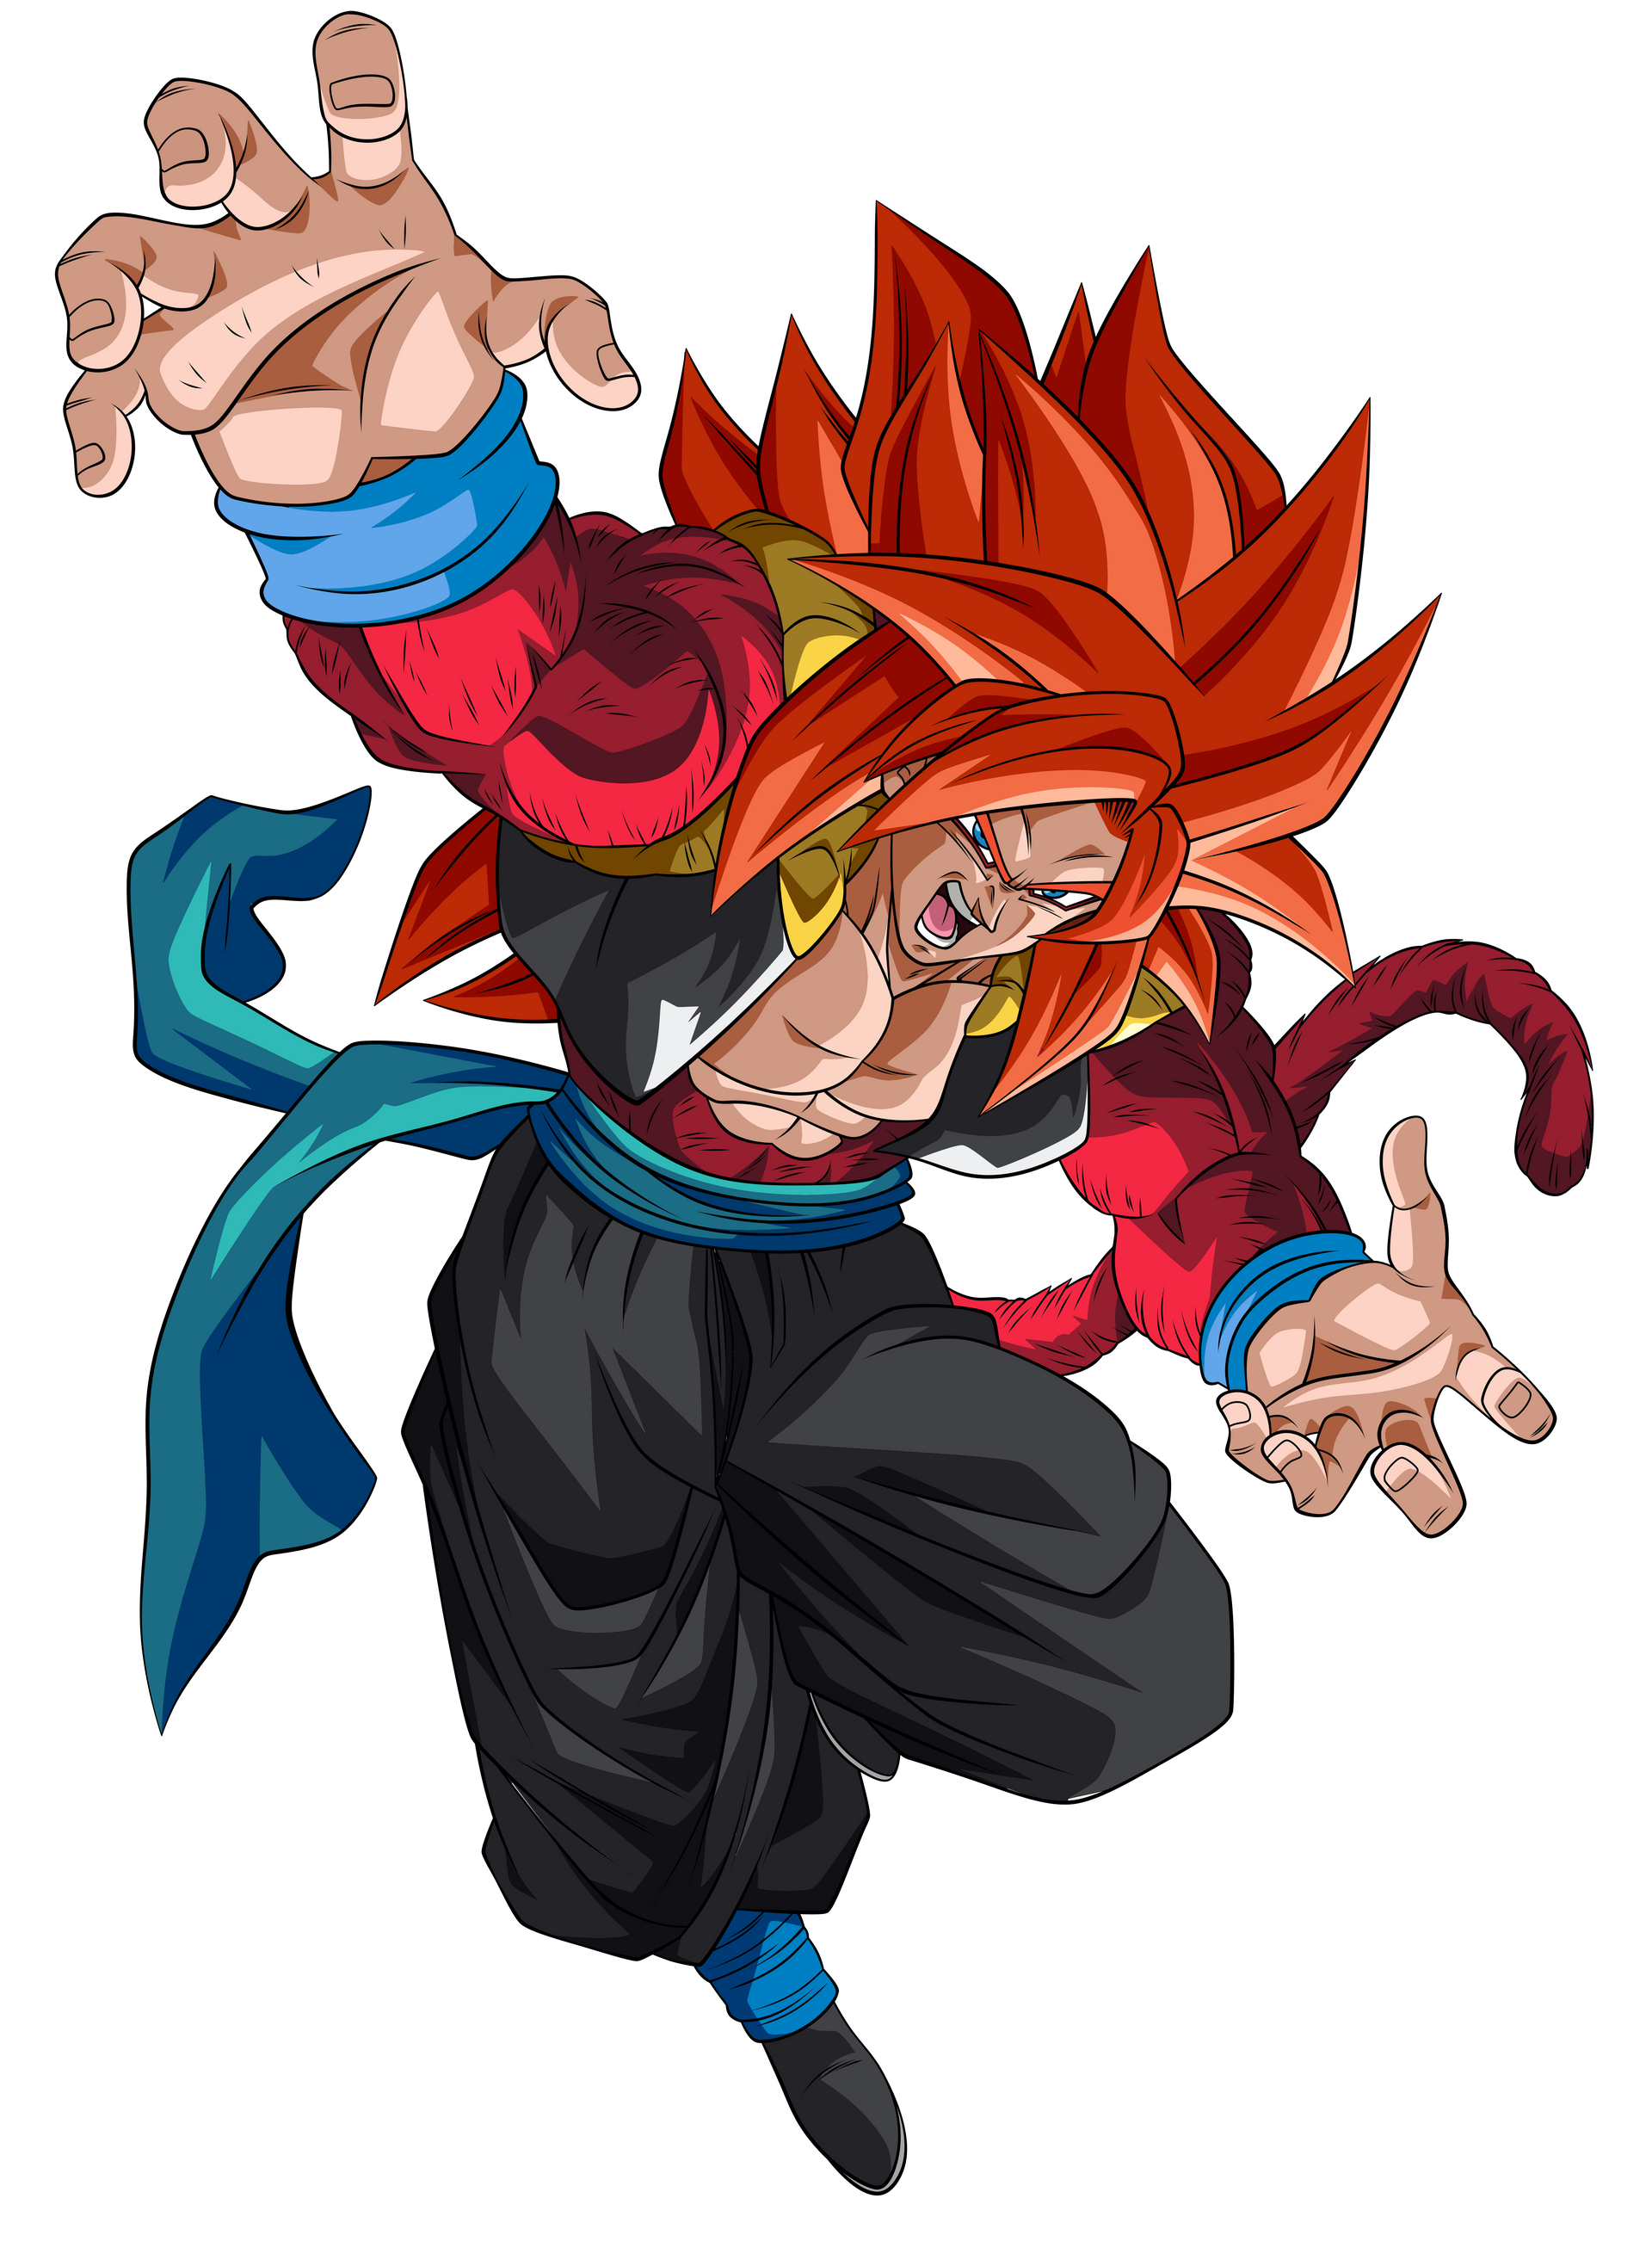 Gogeta Super Saiyajin 4 Render 1 Alt 6 By Ssjrose890 On Deviantart Dragon Ball Super Manga Anime Dragon Ball Super Dragon Ball Super Goku